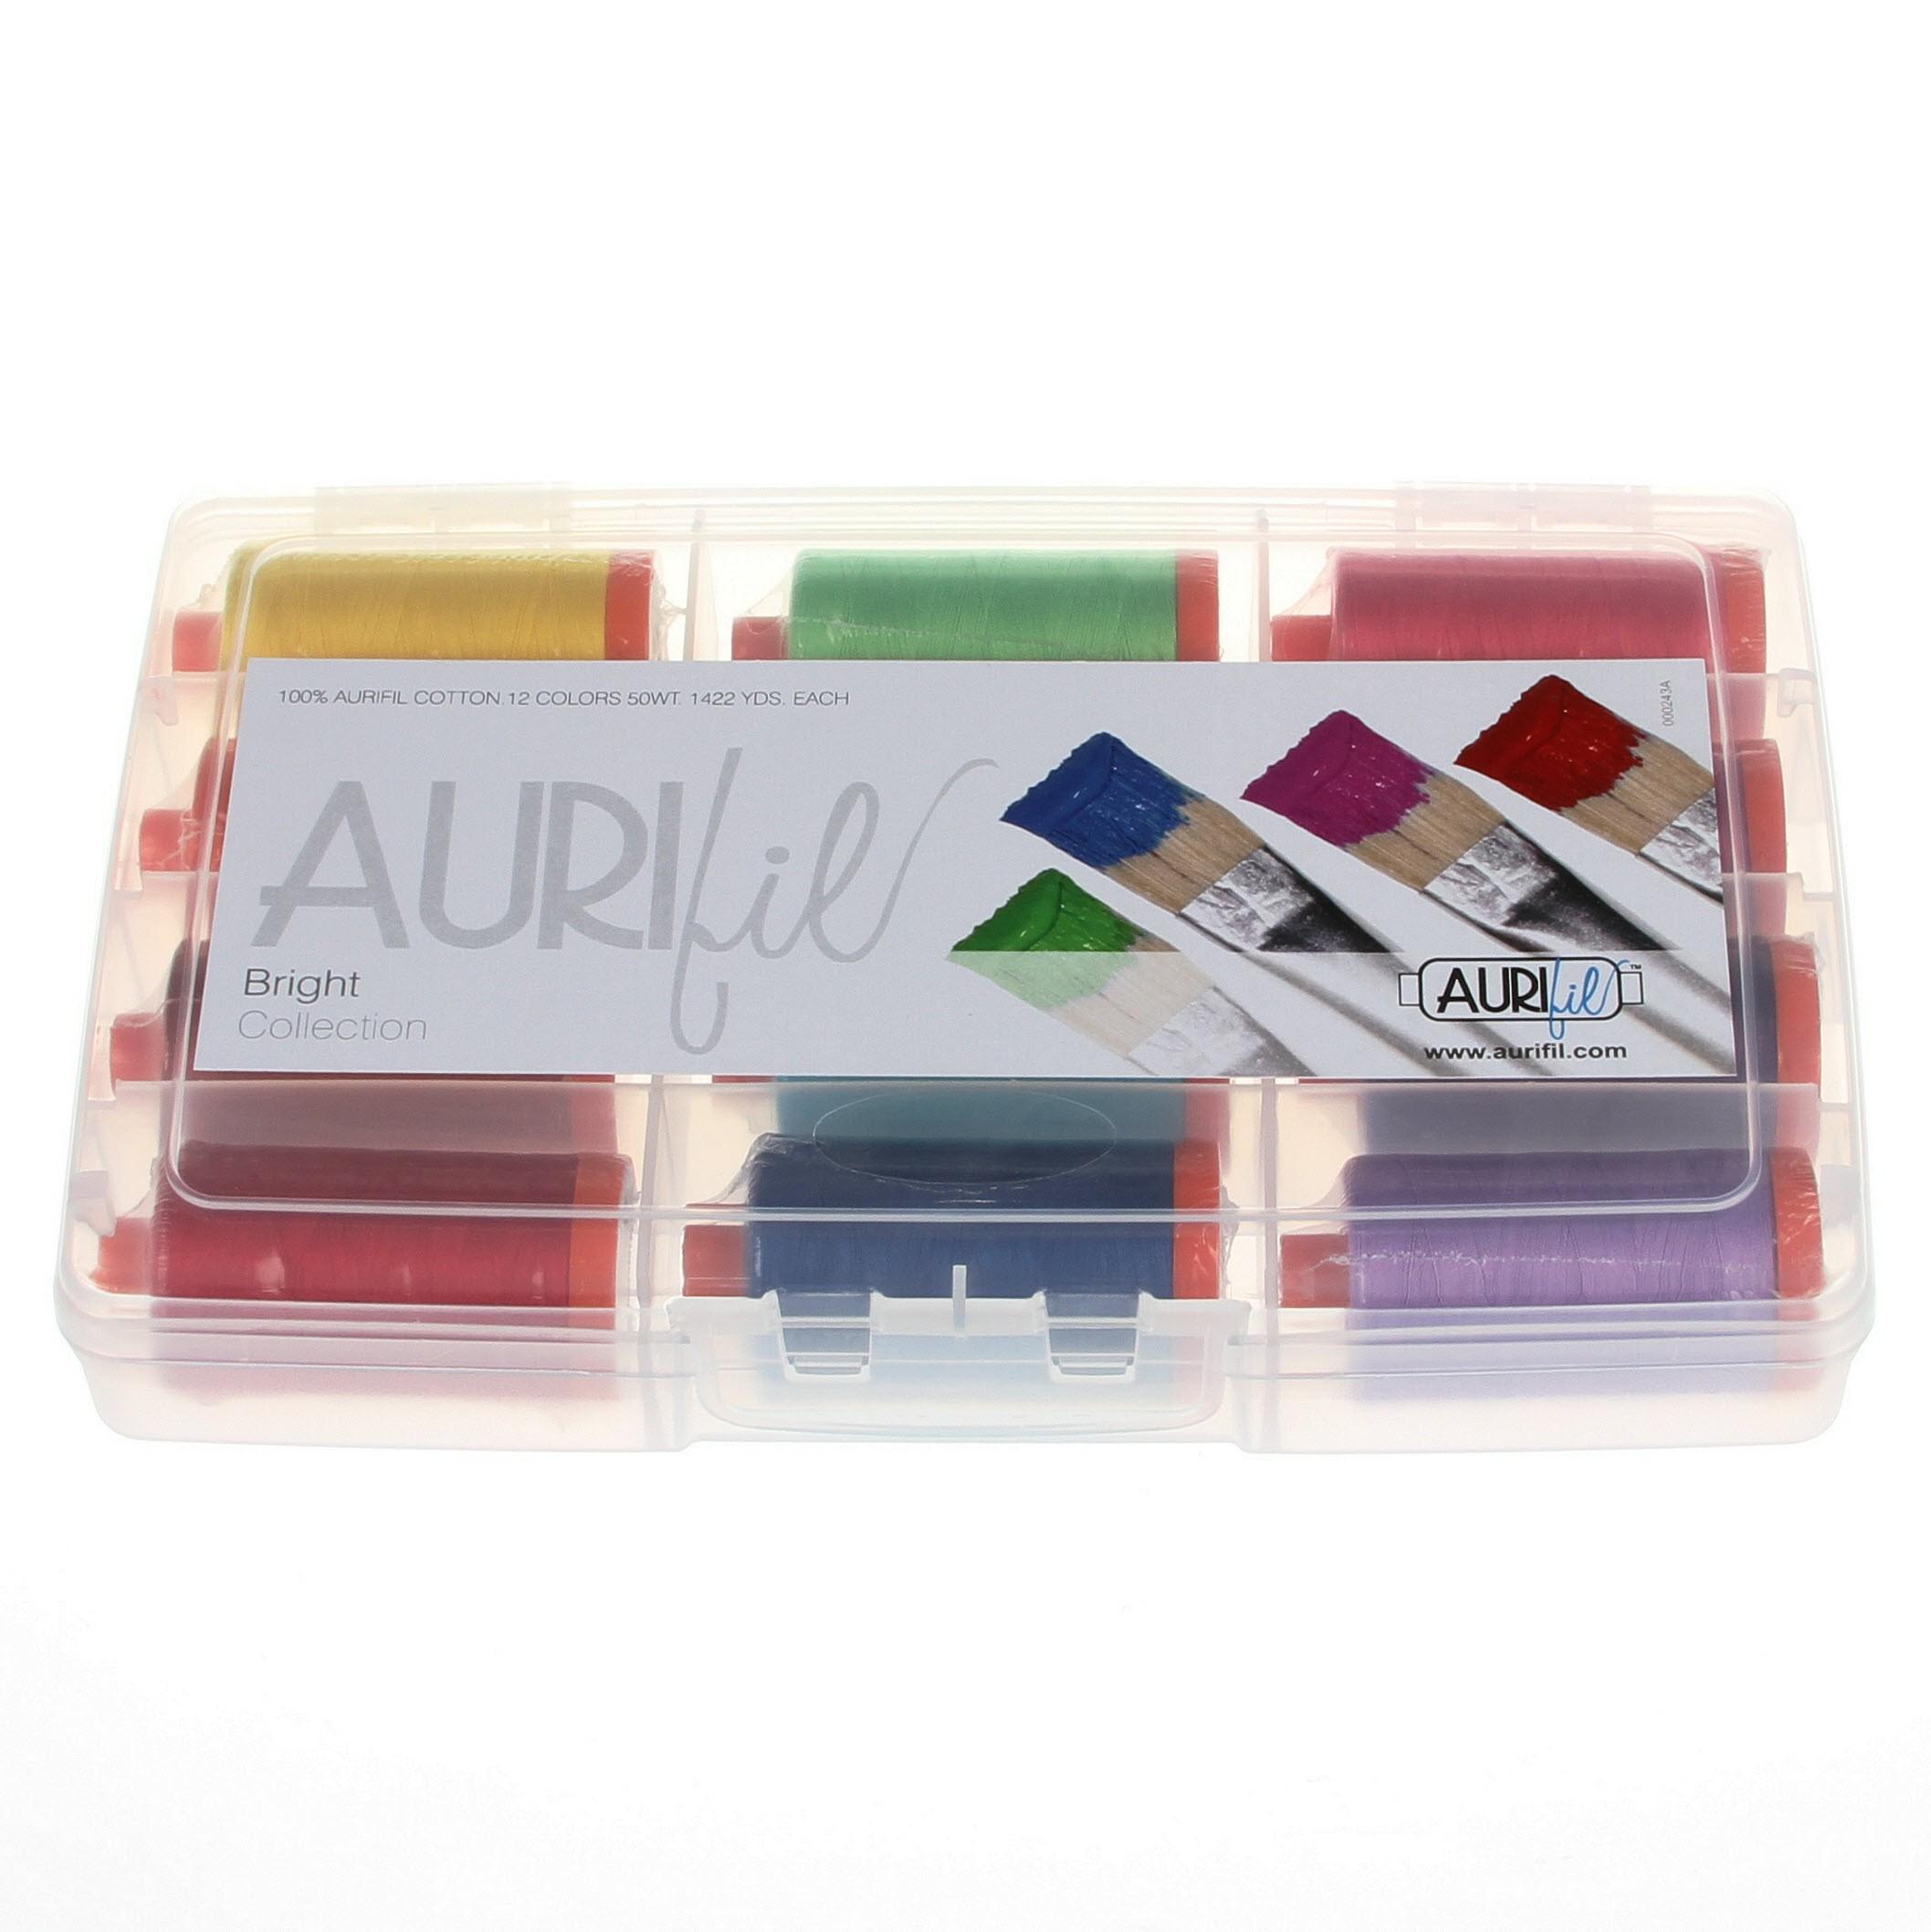 AURIFIL Hero Thread Collection 50wt 3 Large Spools AC50HC3